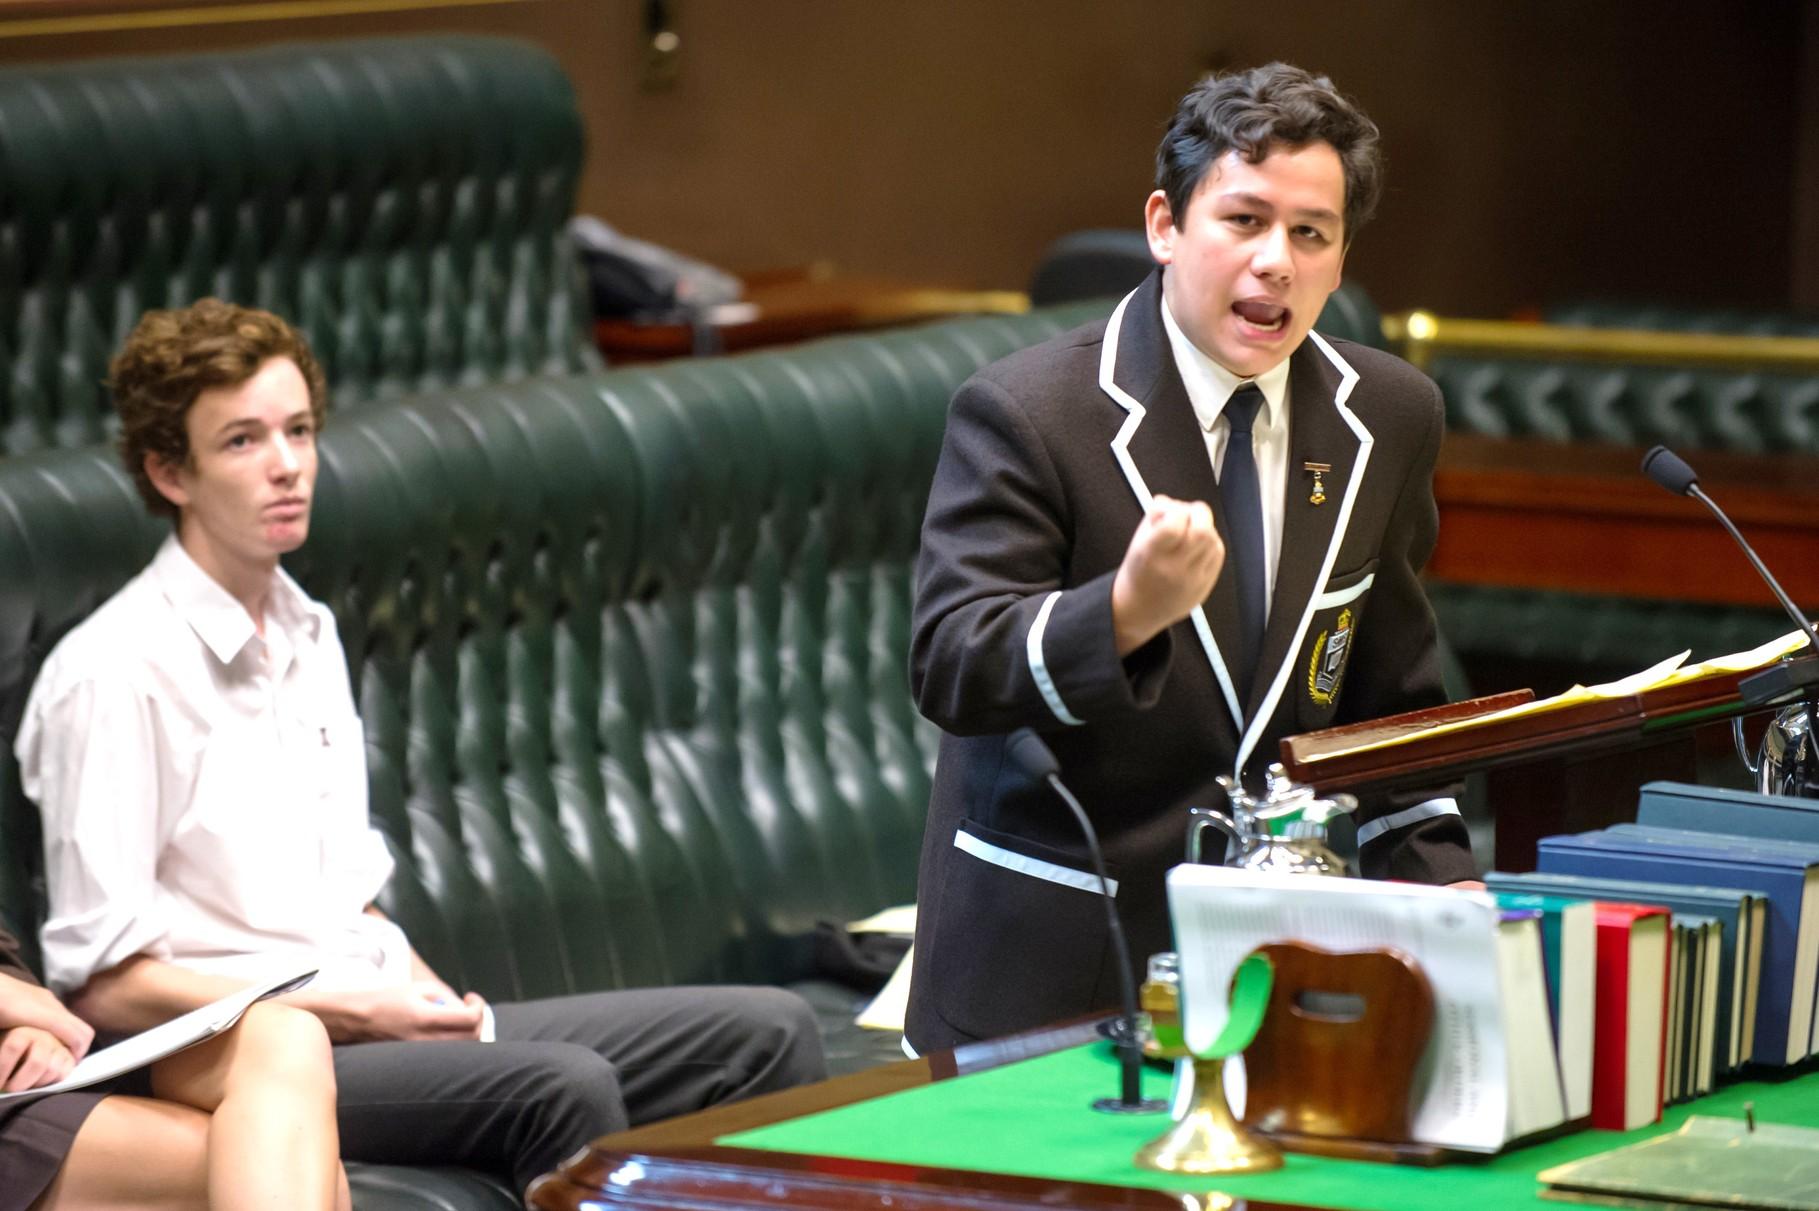 Sydney Boys High representative takes out the best 'public speaker' award